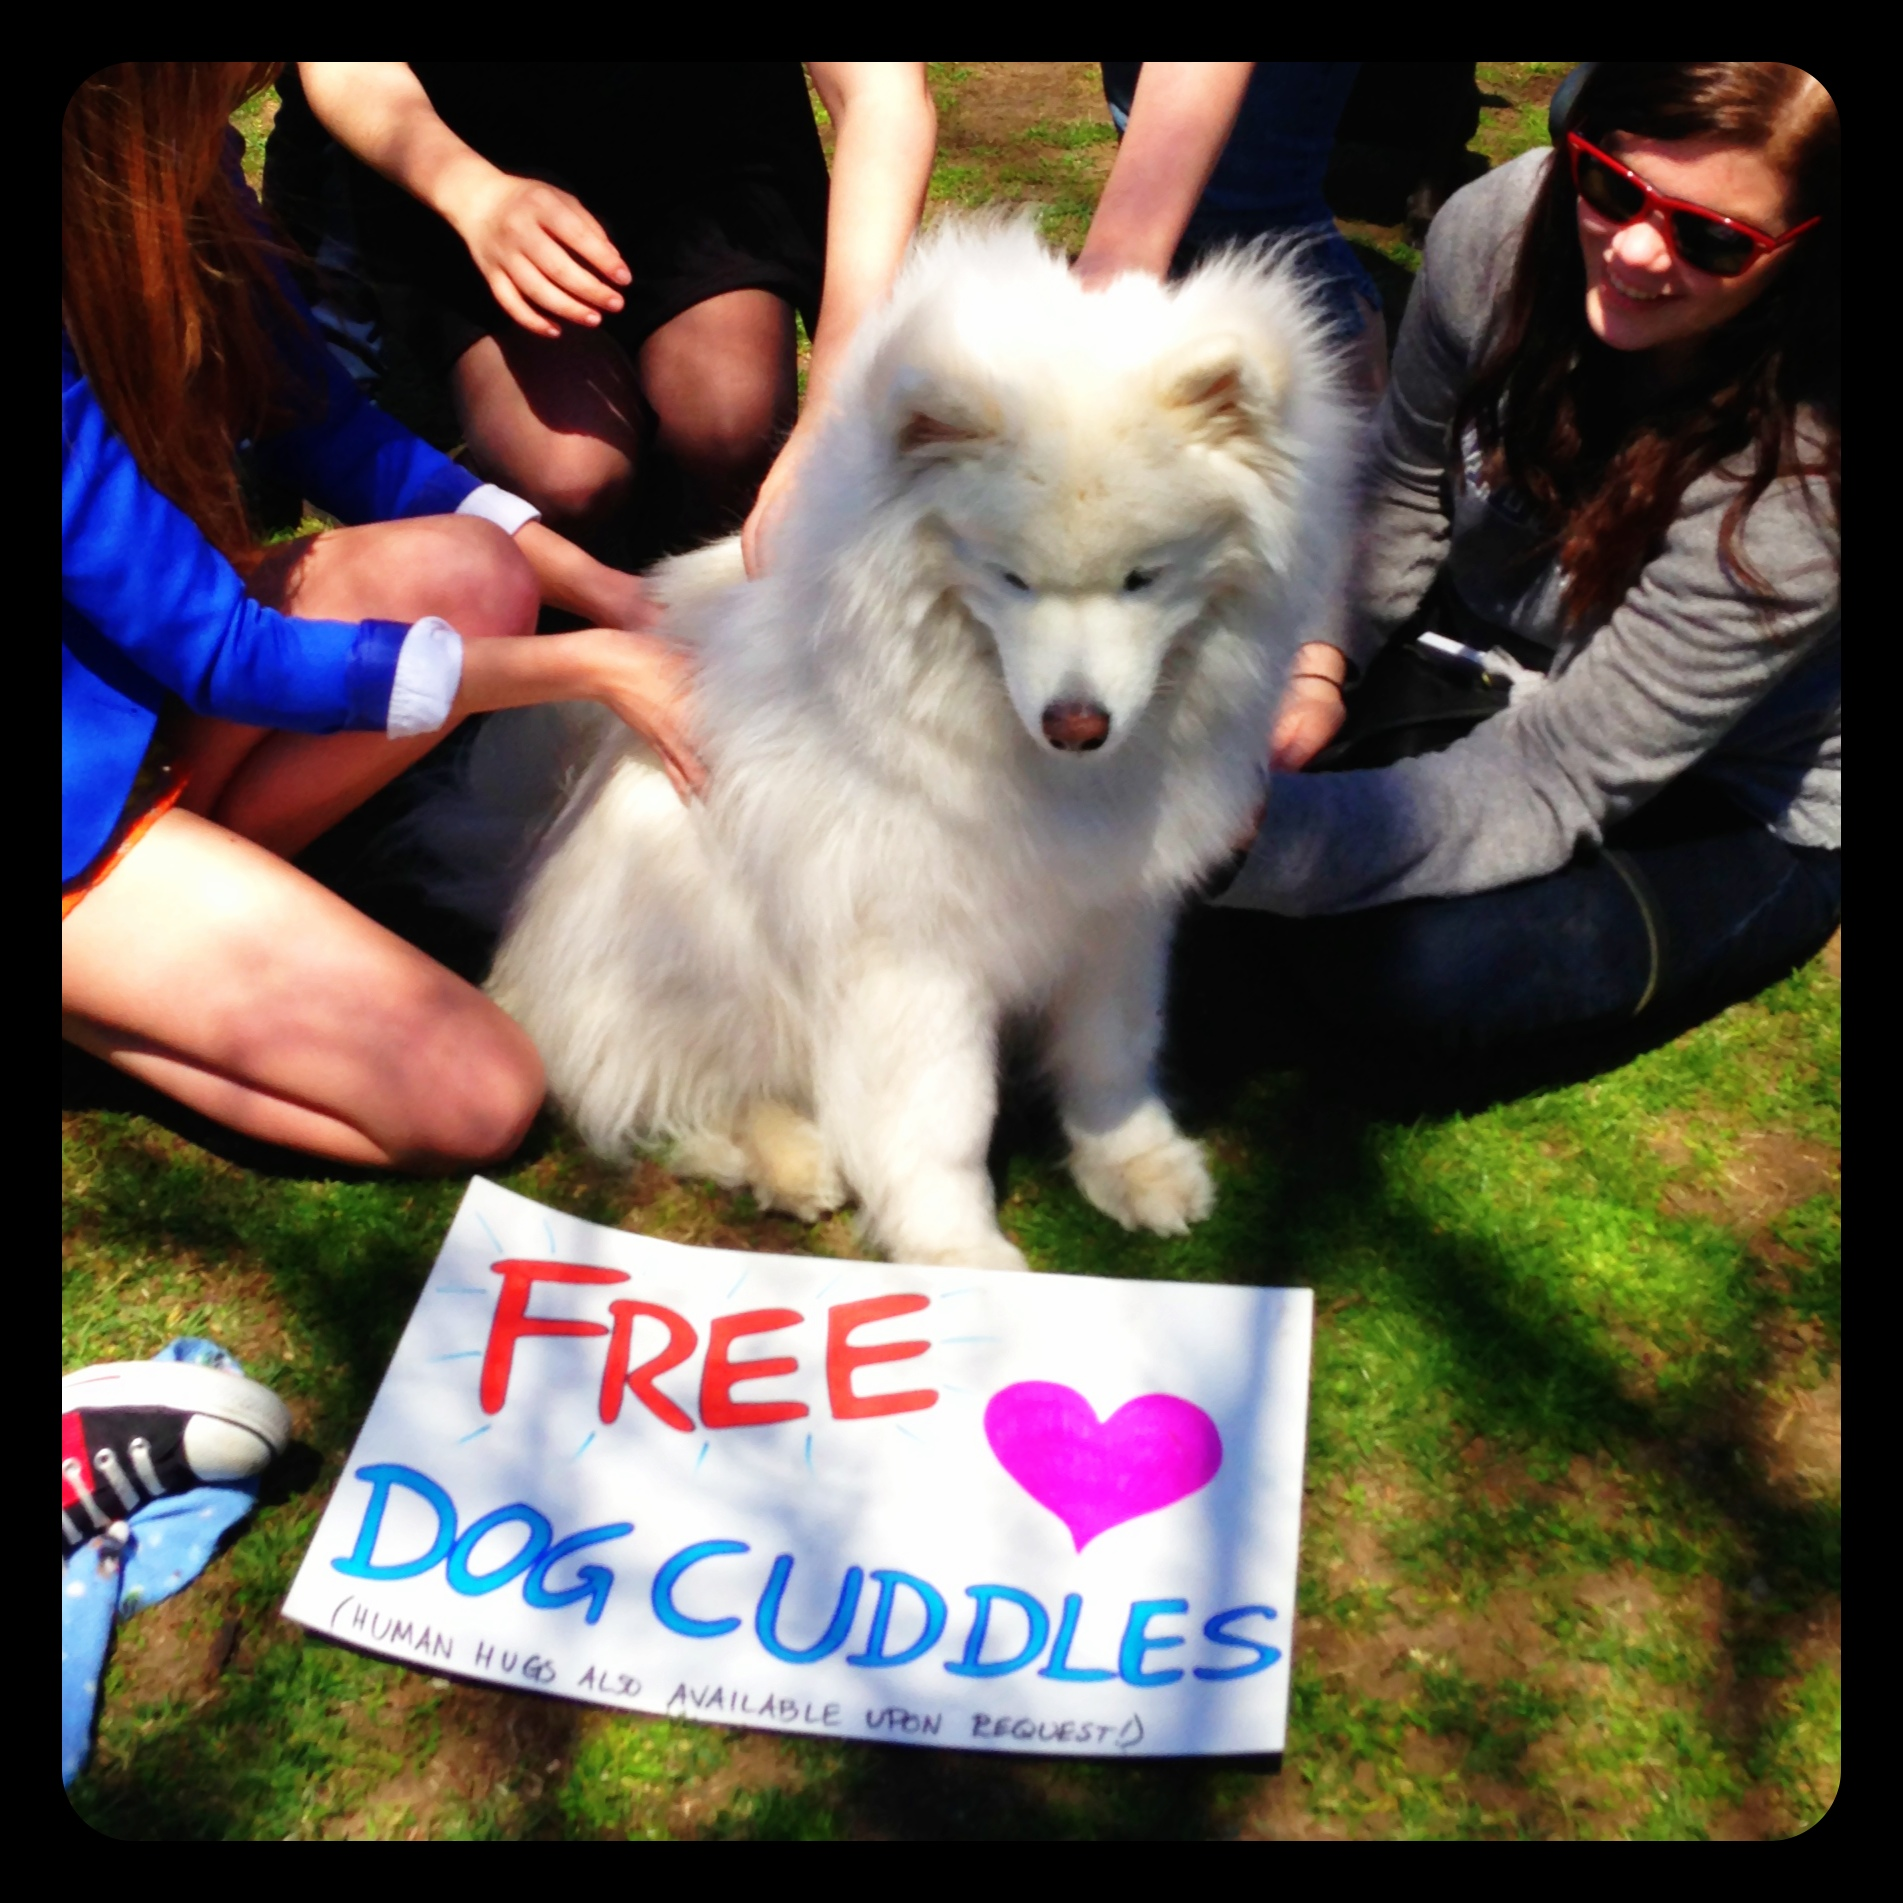 Free Dog Cuddles, Boston Common